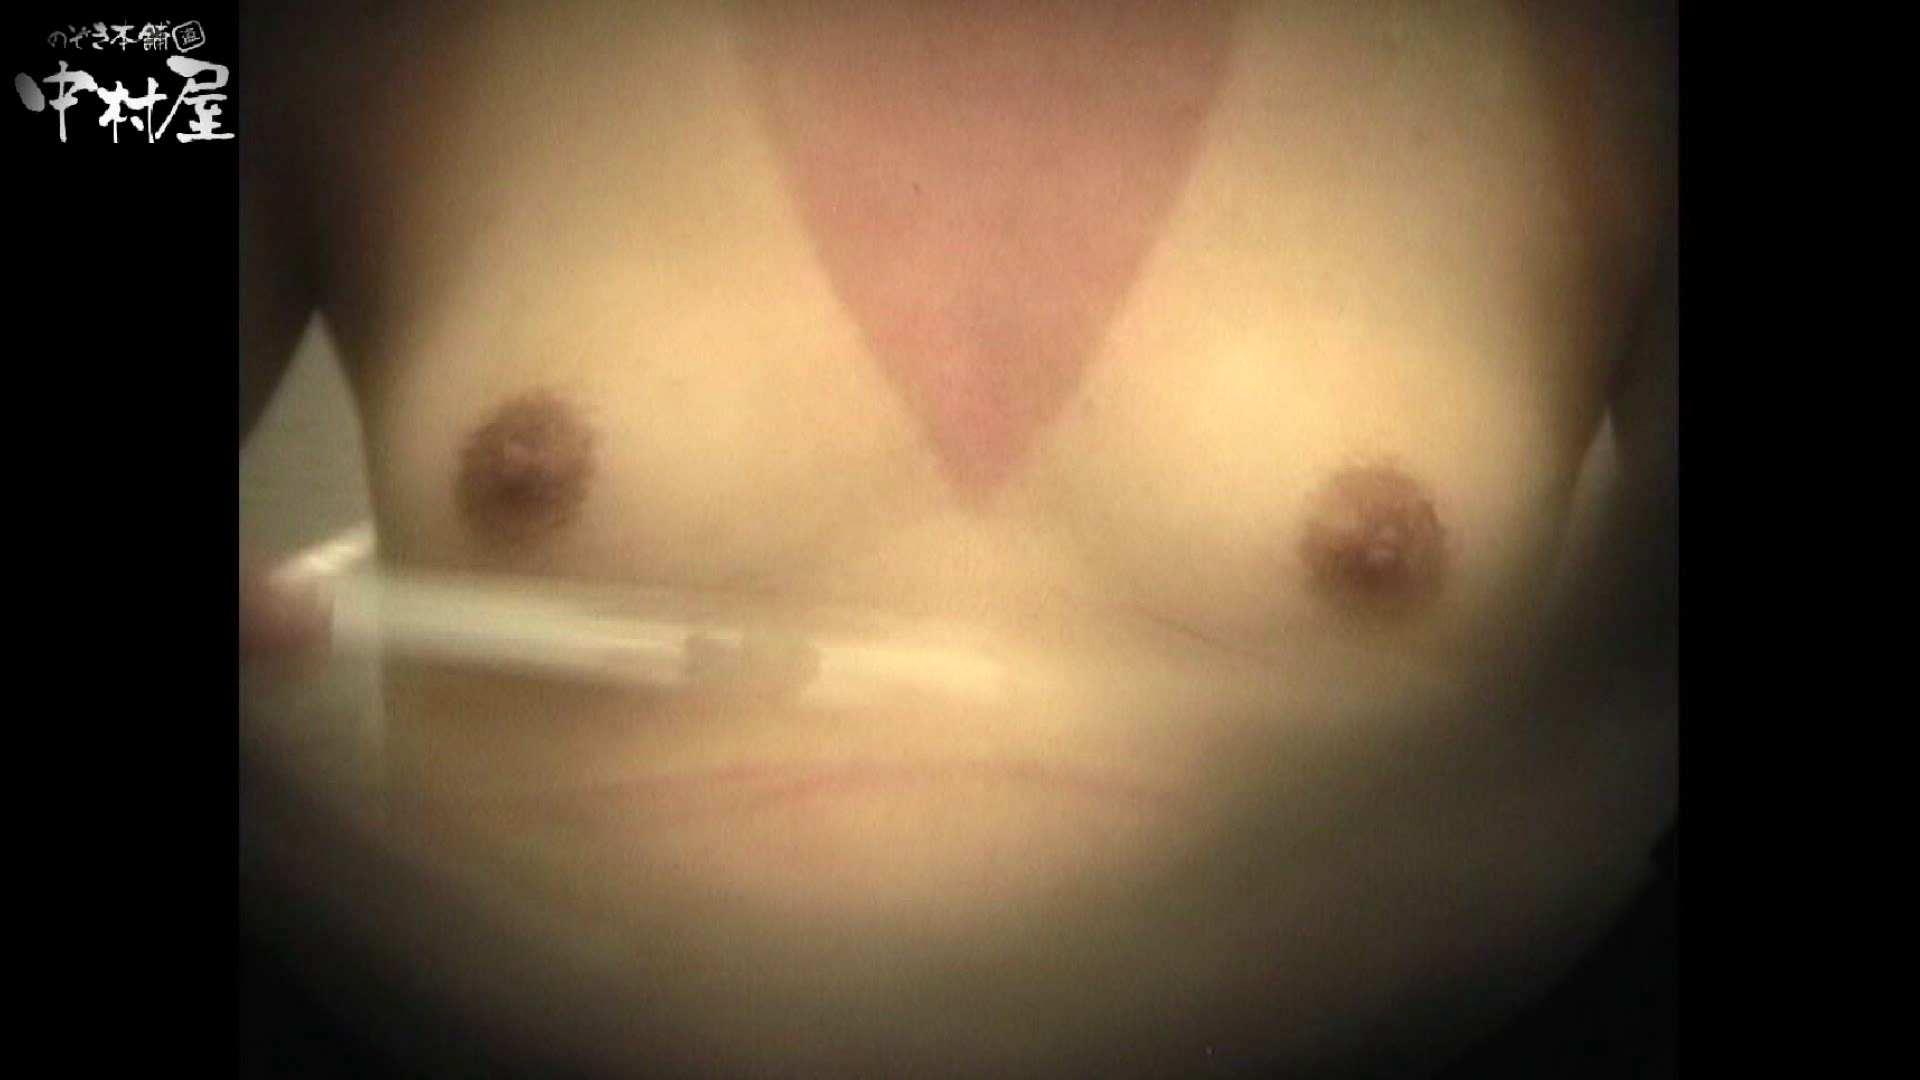 No.32 脇とVラインの処理が甘い貧乳ギャル、タンポンの紐がぶらぶら 貧乳 エロ無料画像 75PIX 59